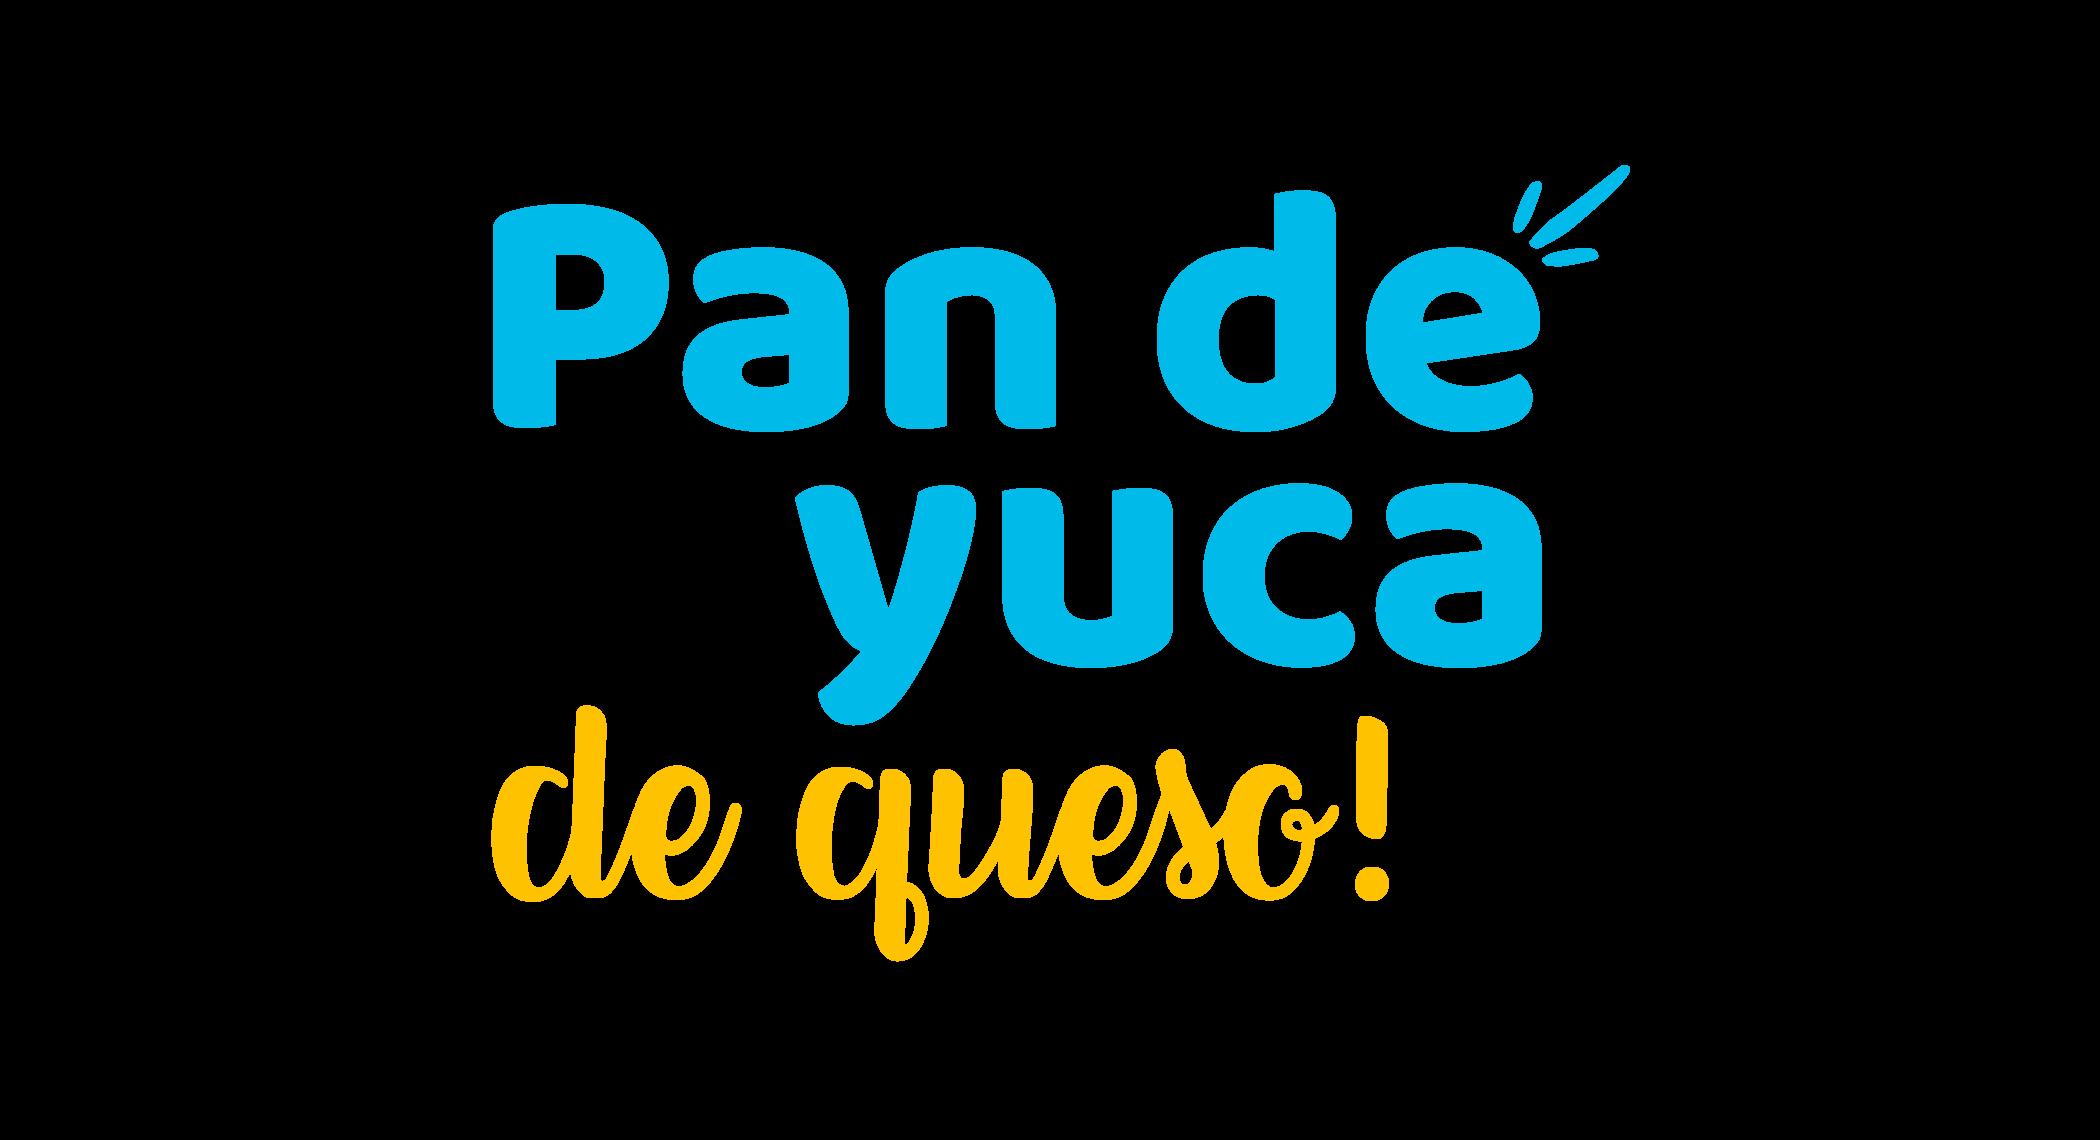 Avena Cubana, Pan de yuca de queso